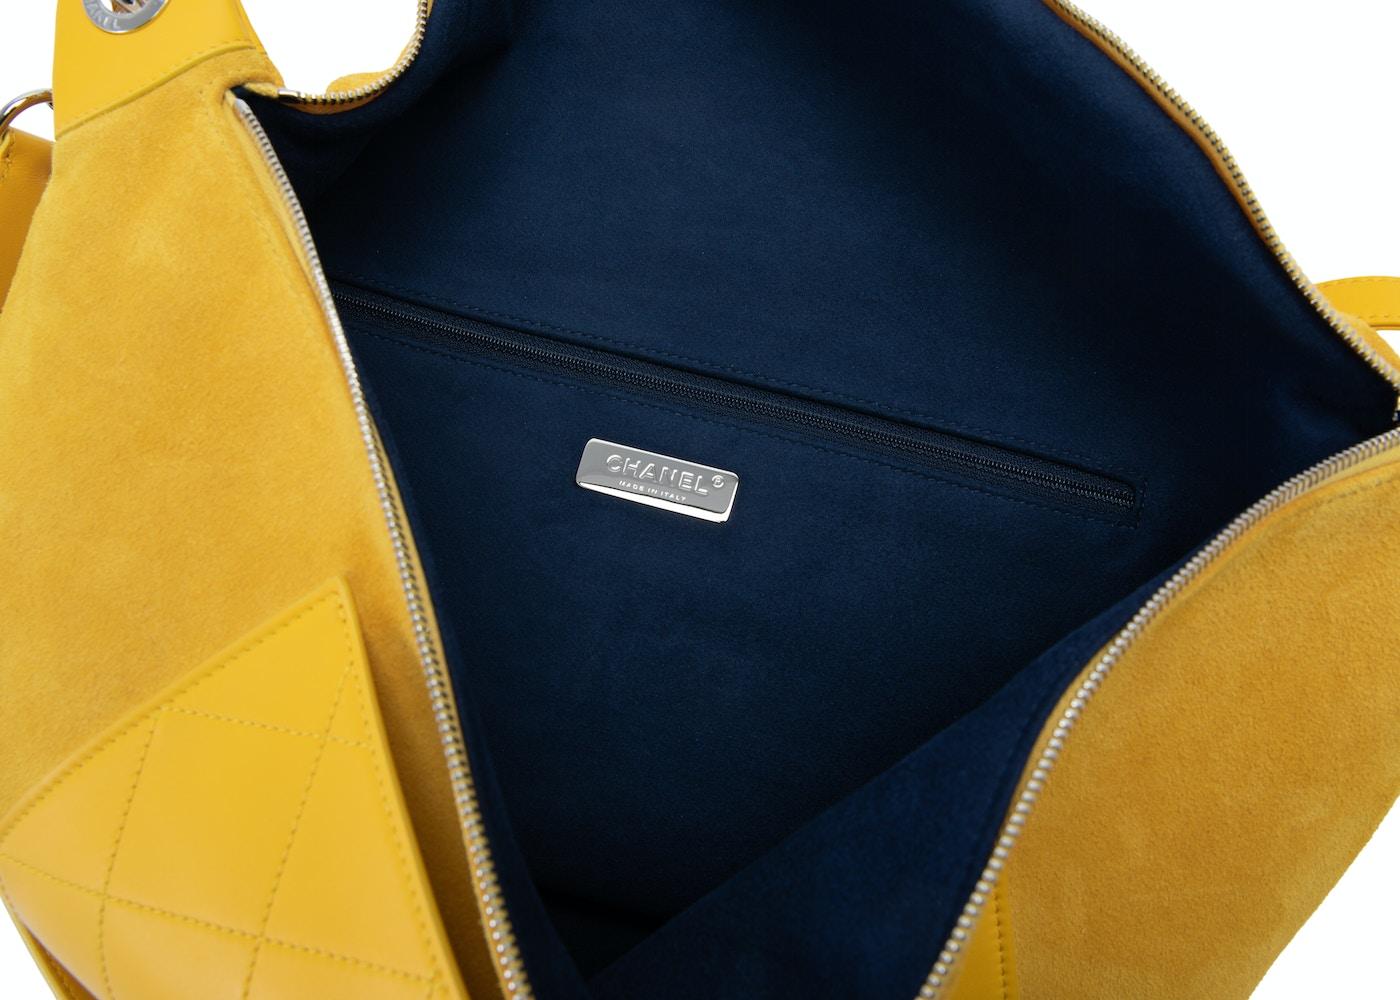 f8b2179e2 Chanel x Pharrell Waist Bag Yellow